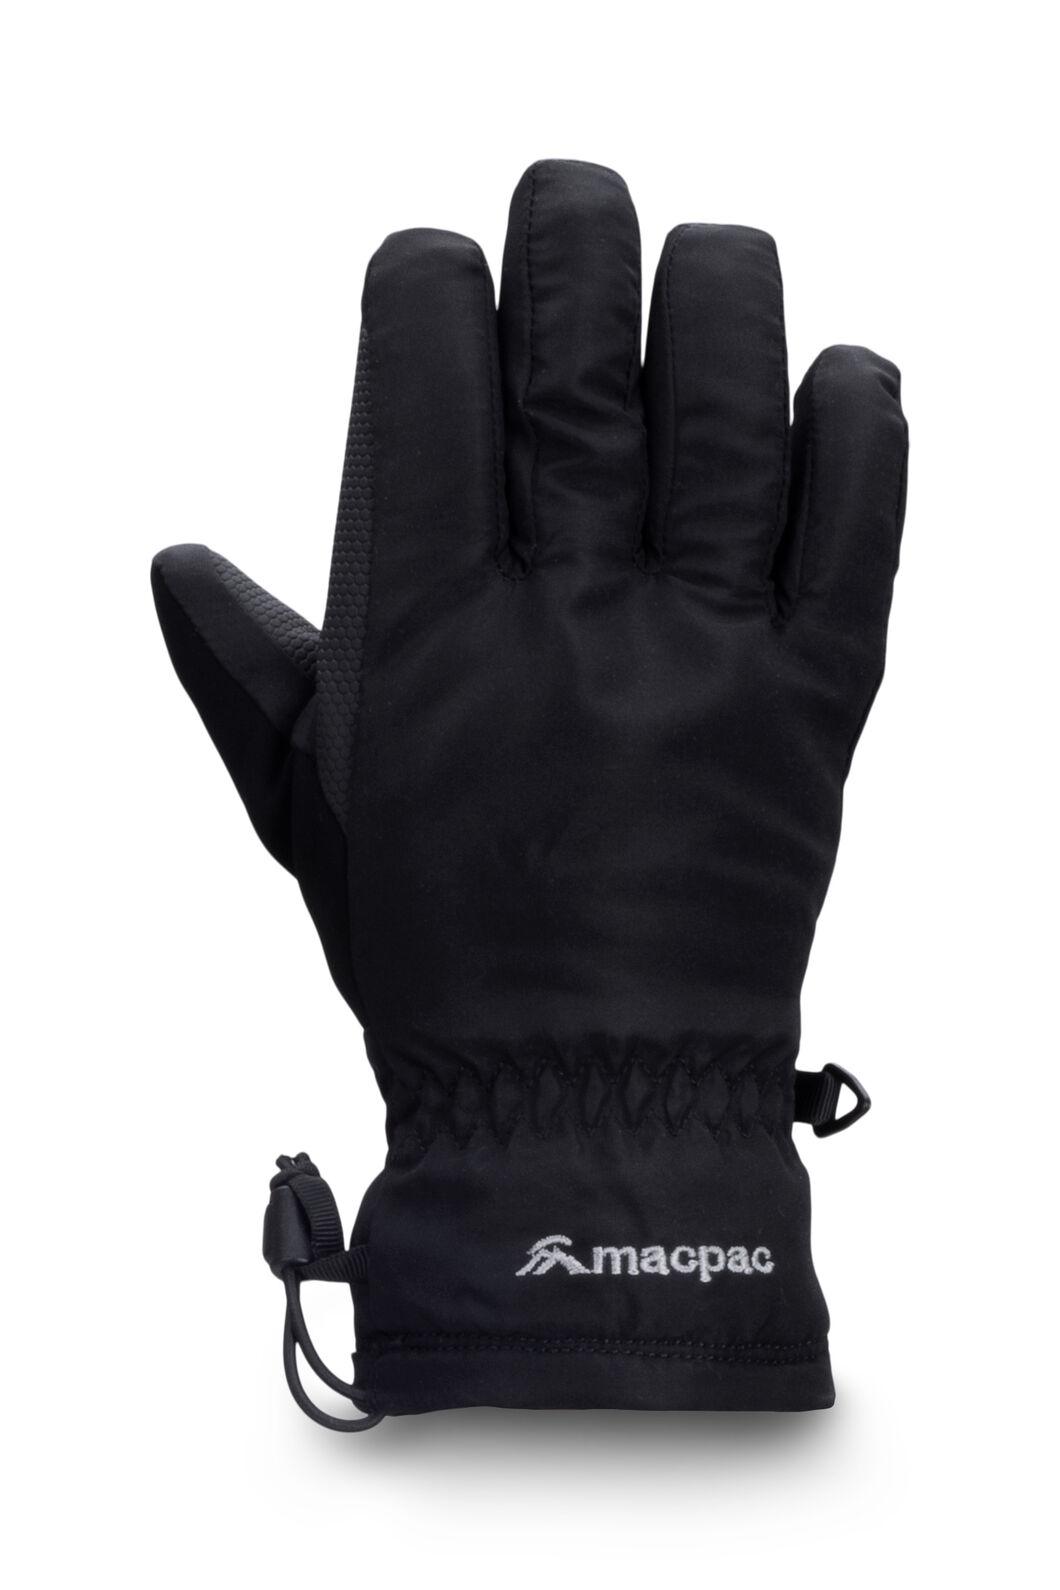 Macpac Kids' Spree Reflex™ Ski Gloves, Black, hi-res